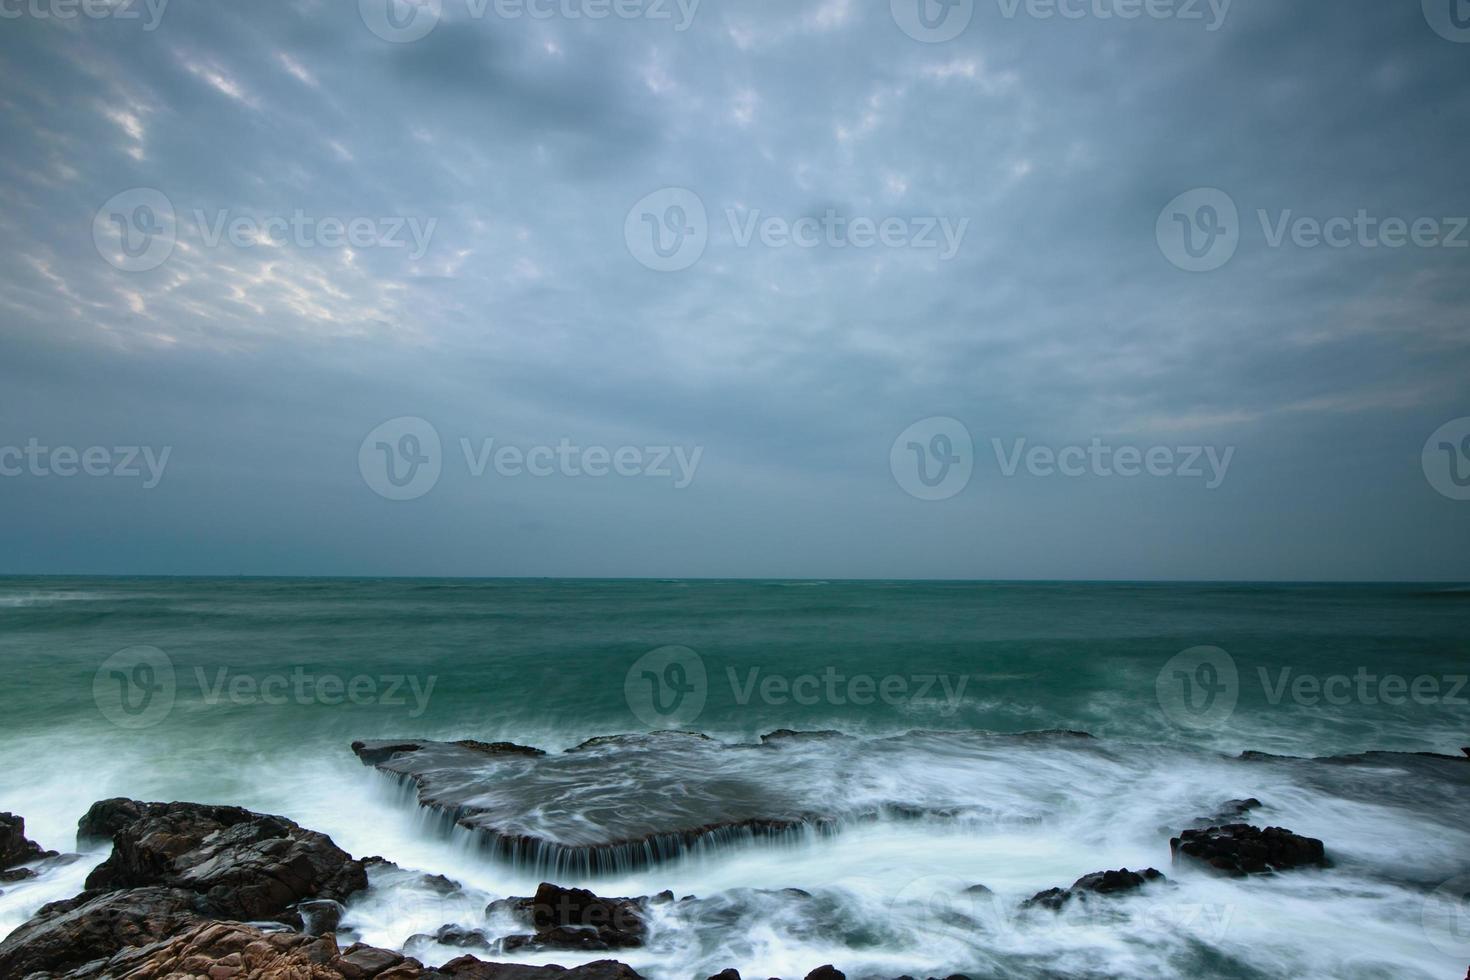 cachoeiras do oceano, ondas grandes foto